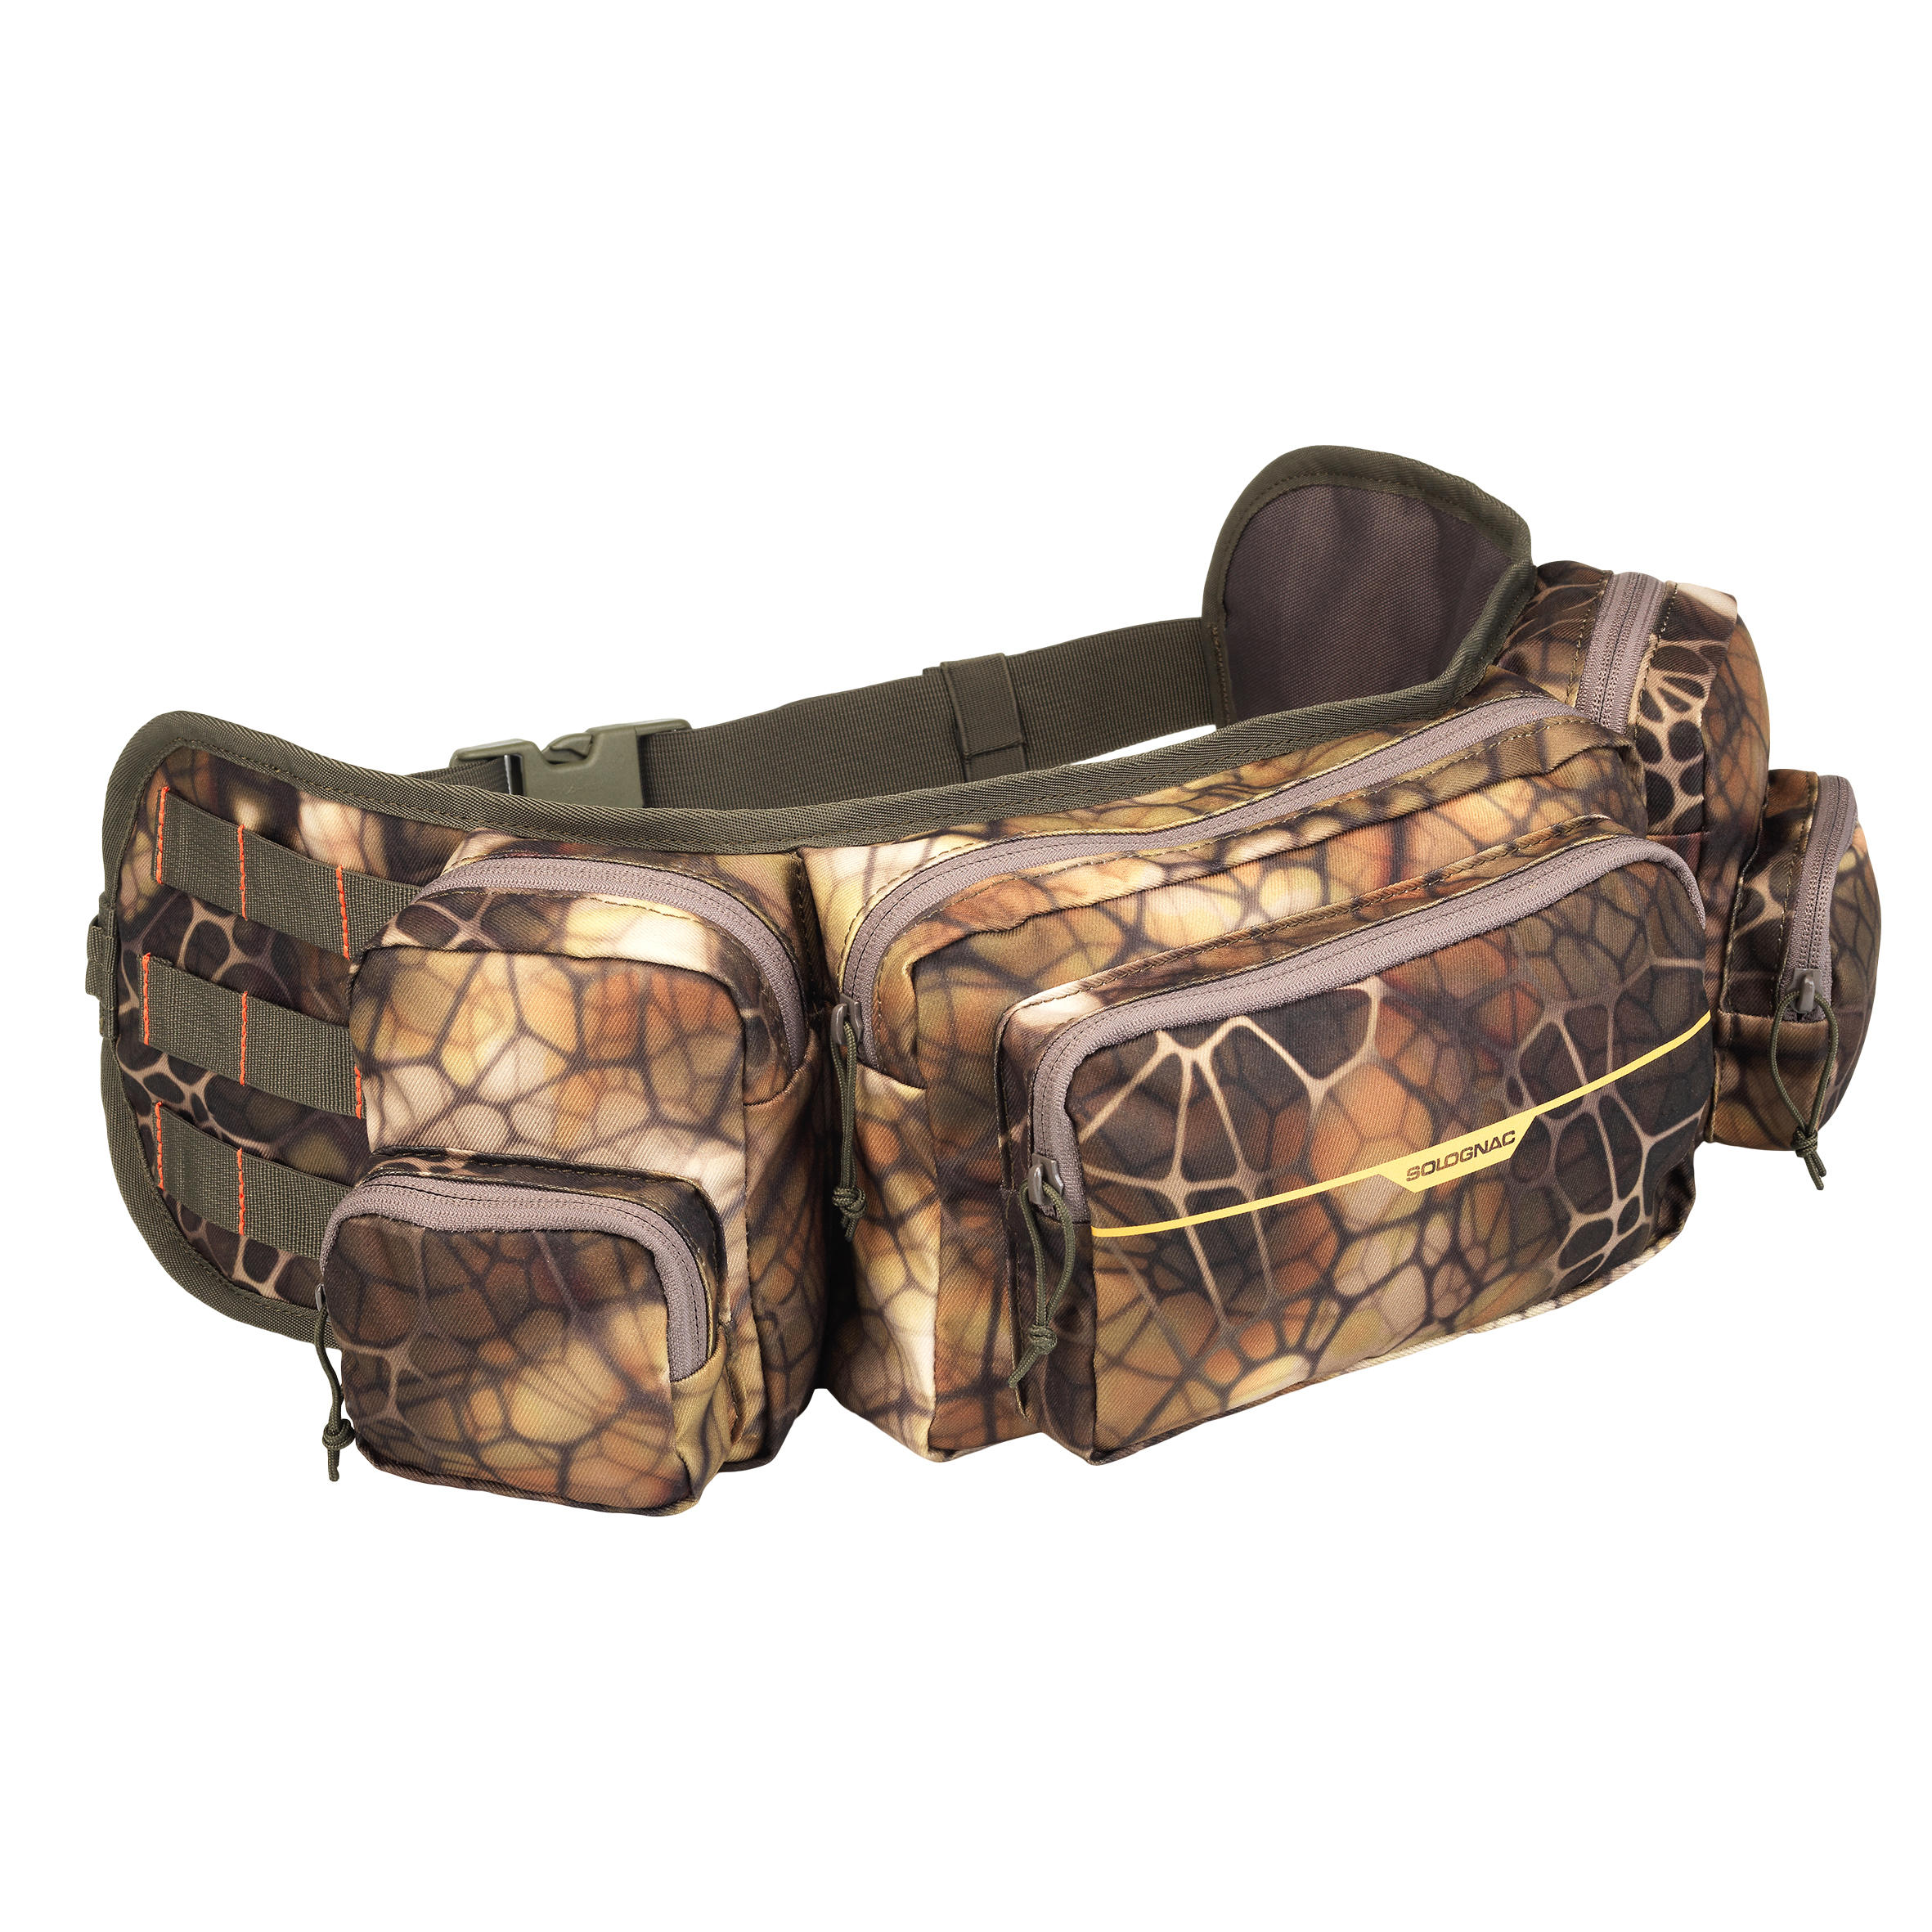 X-Access Waist Bag 7 Litres - Furtiv Camouflage